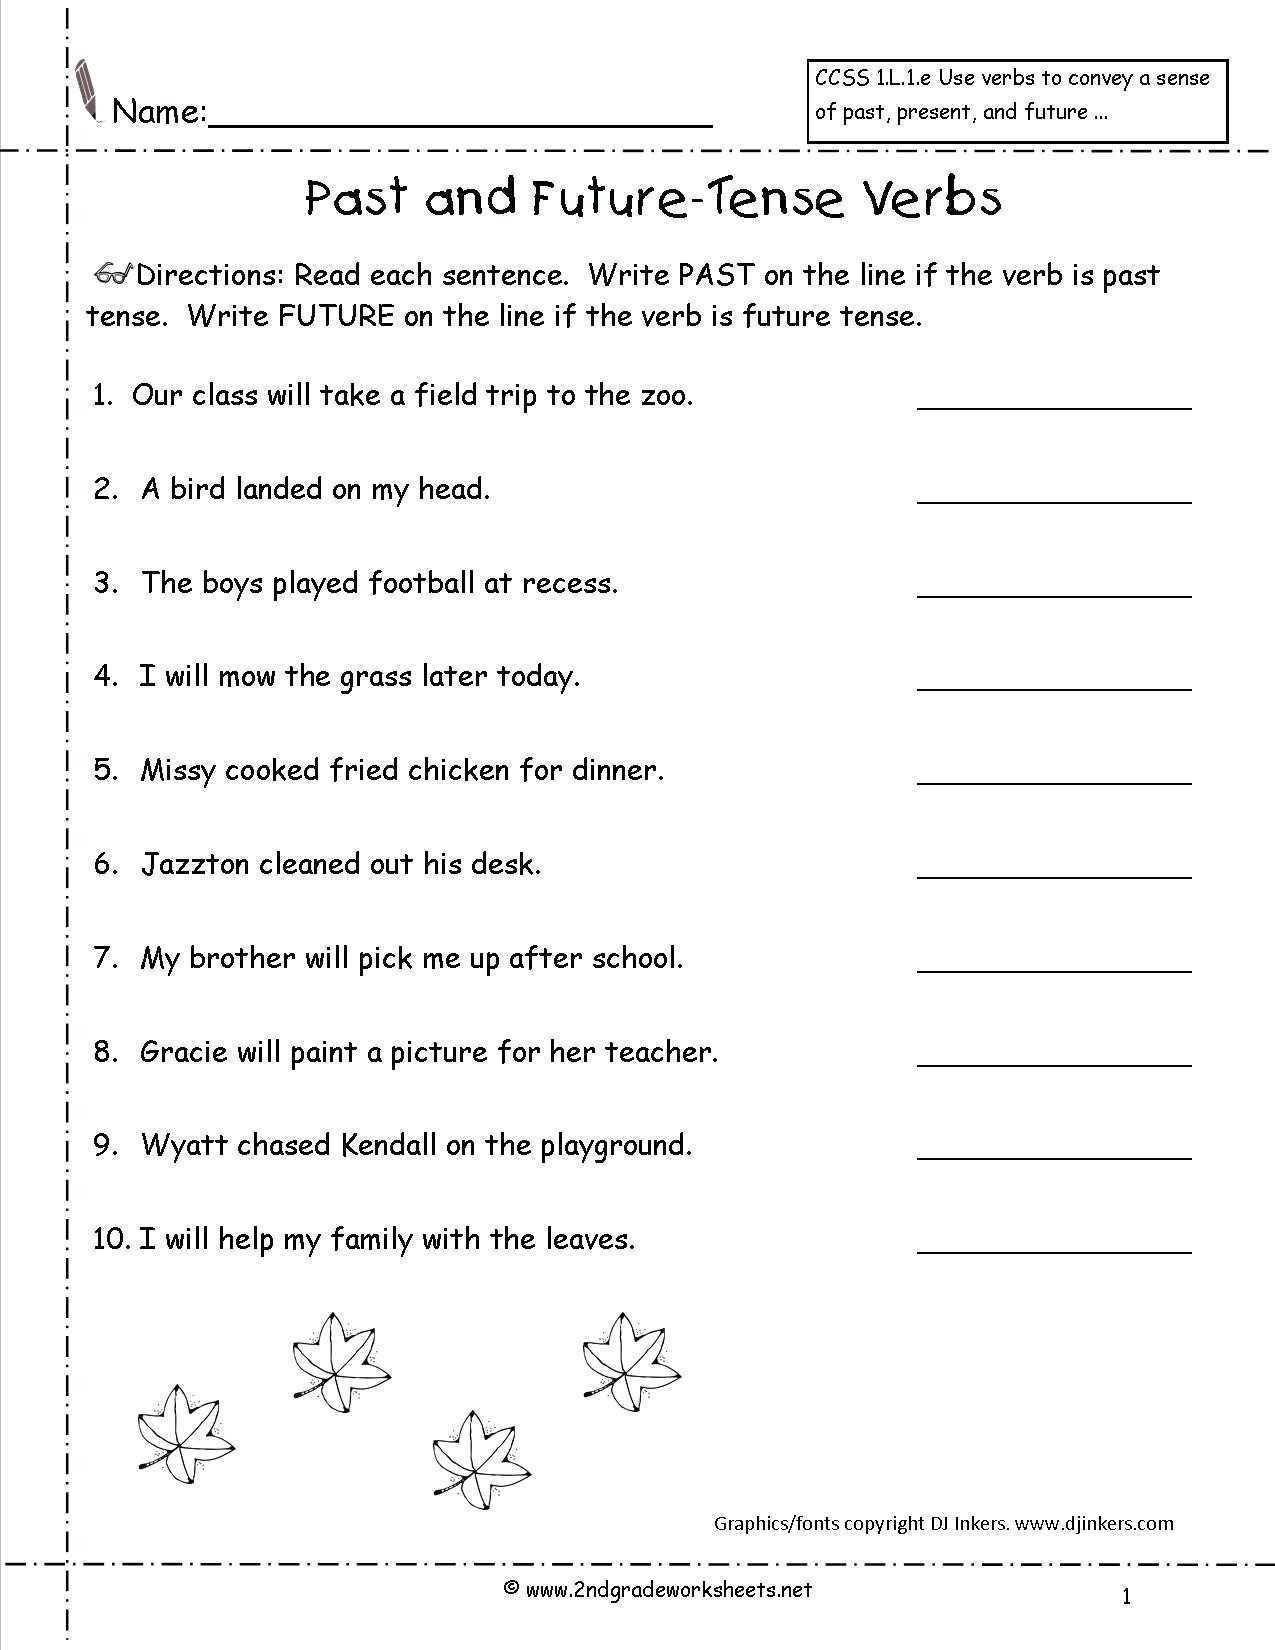 Genetics Basics Worksheet And Joyplace Ampquot Excel Copy